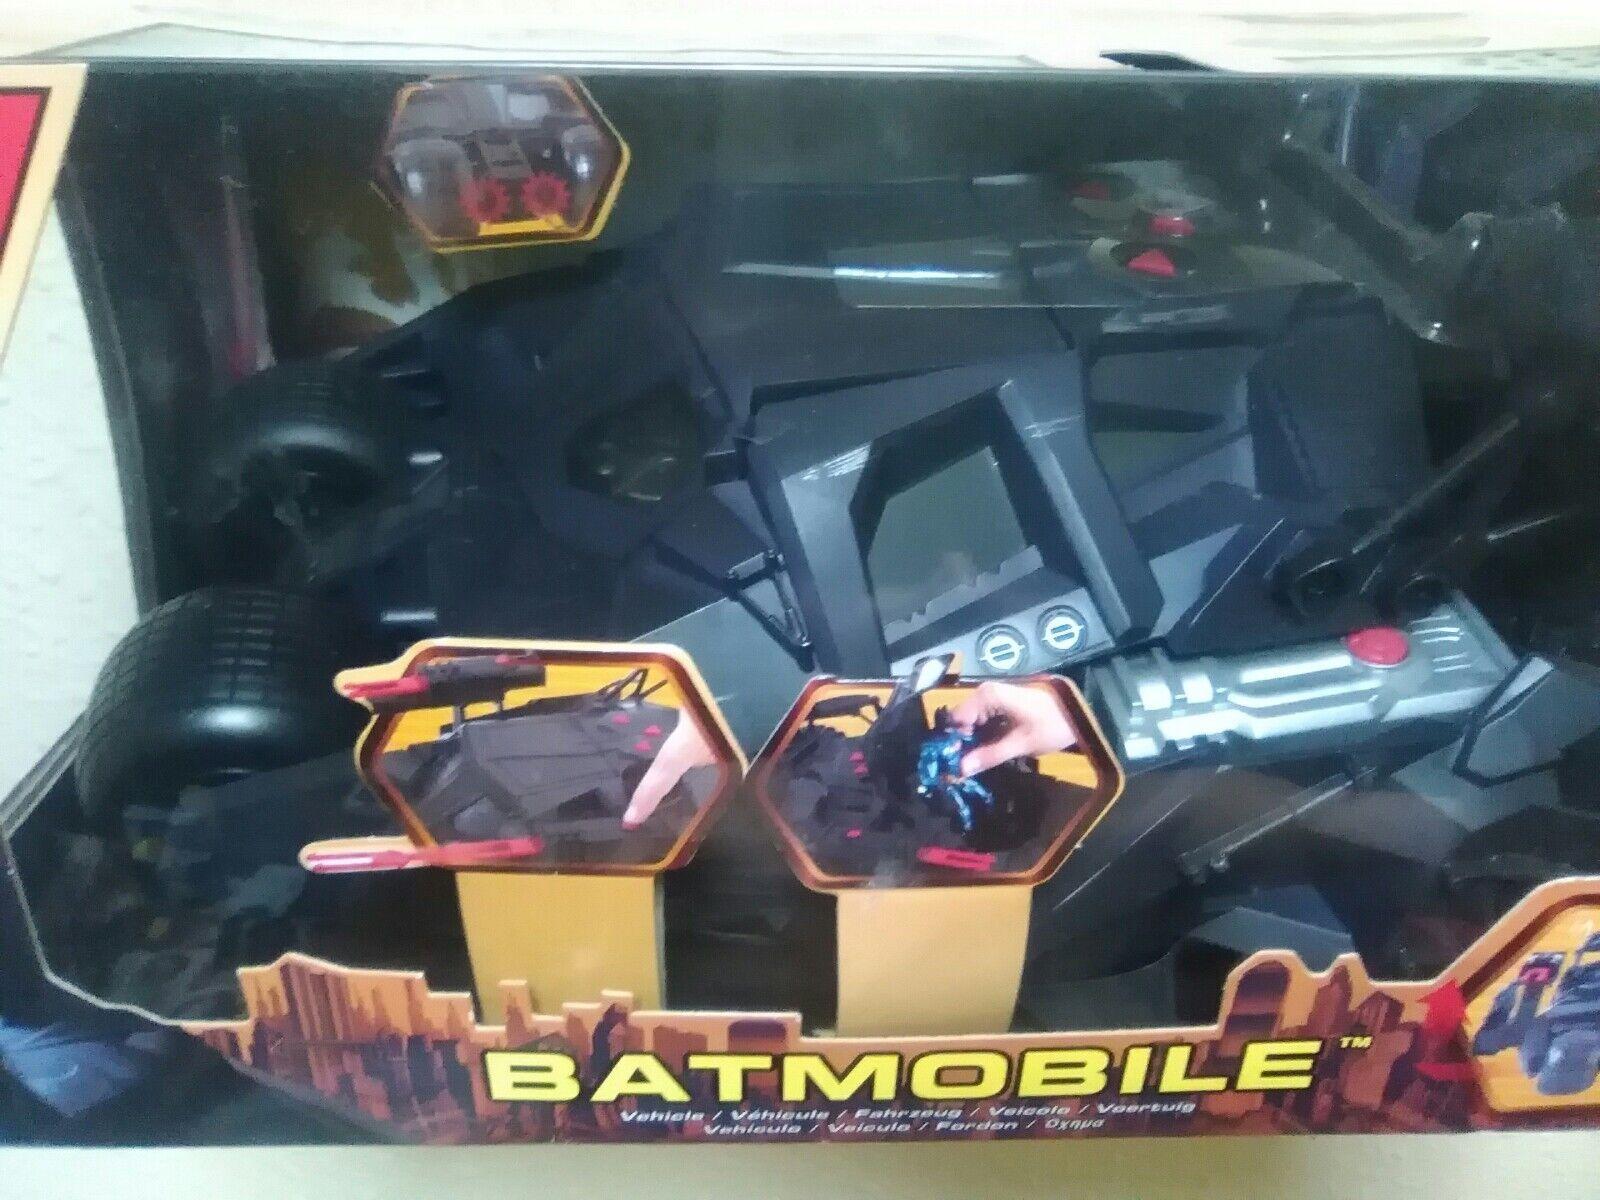 BATMOBILE - TUMBLER - ACROBATA - BATMAN BEGINS - MATTEL - NUEVO A ESTRENAR